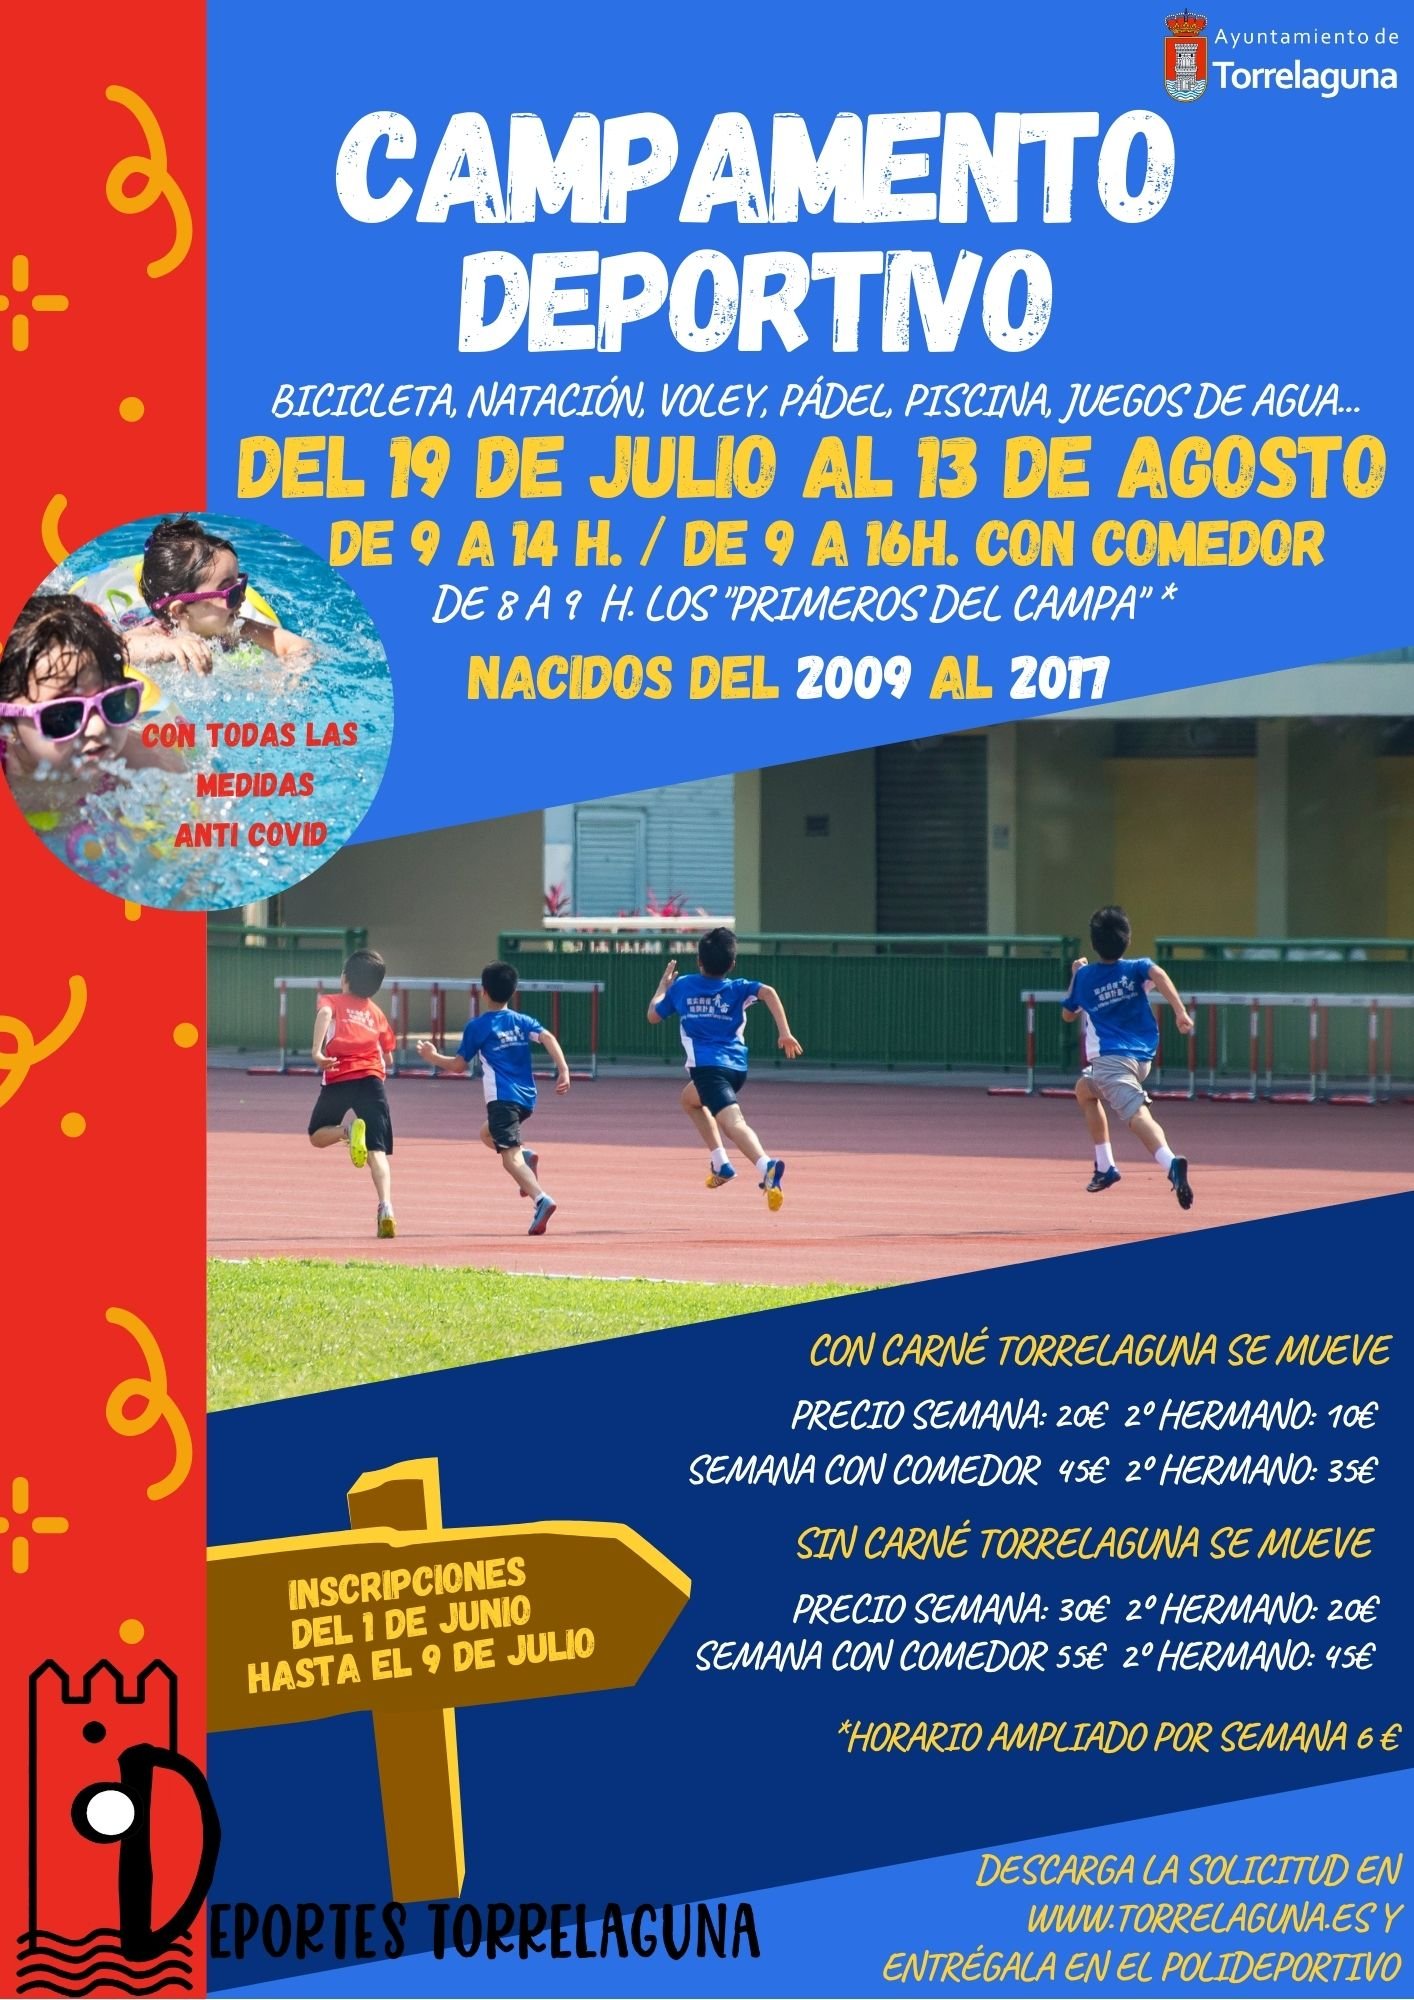 Campamento deportivo en Torrelaguna